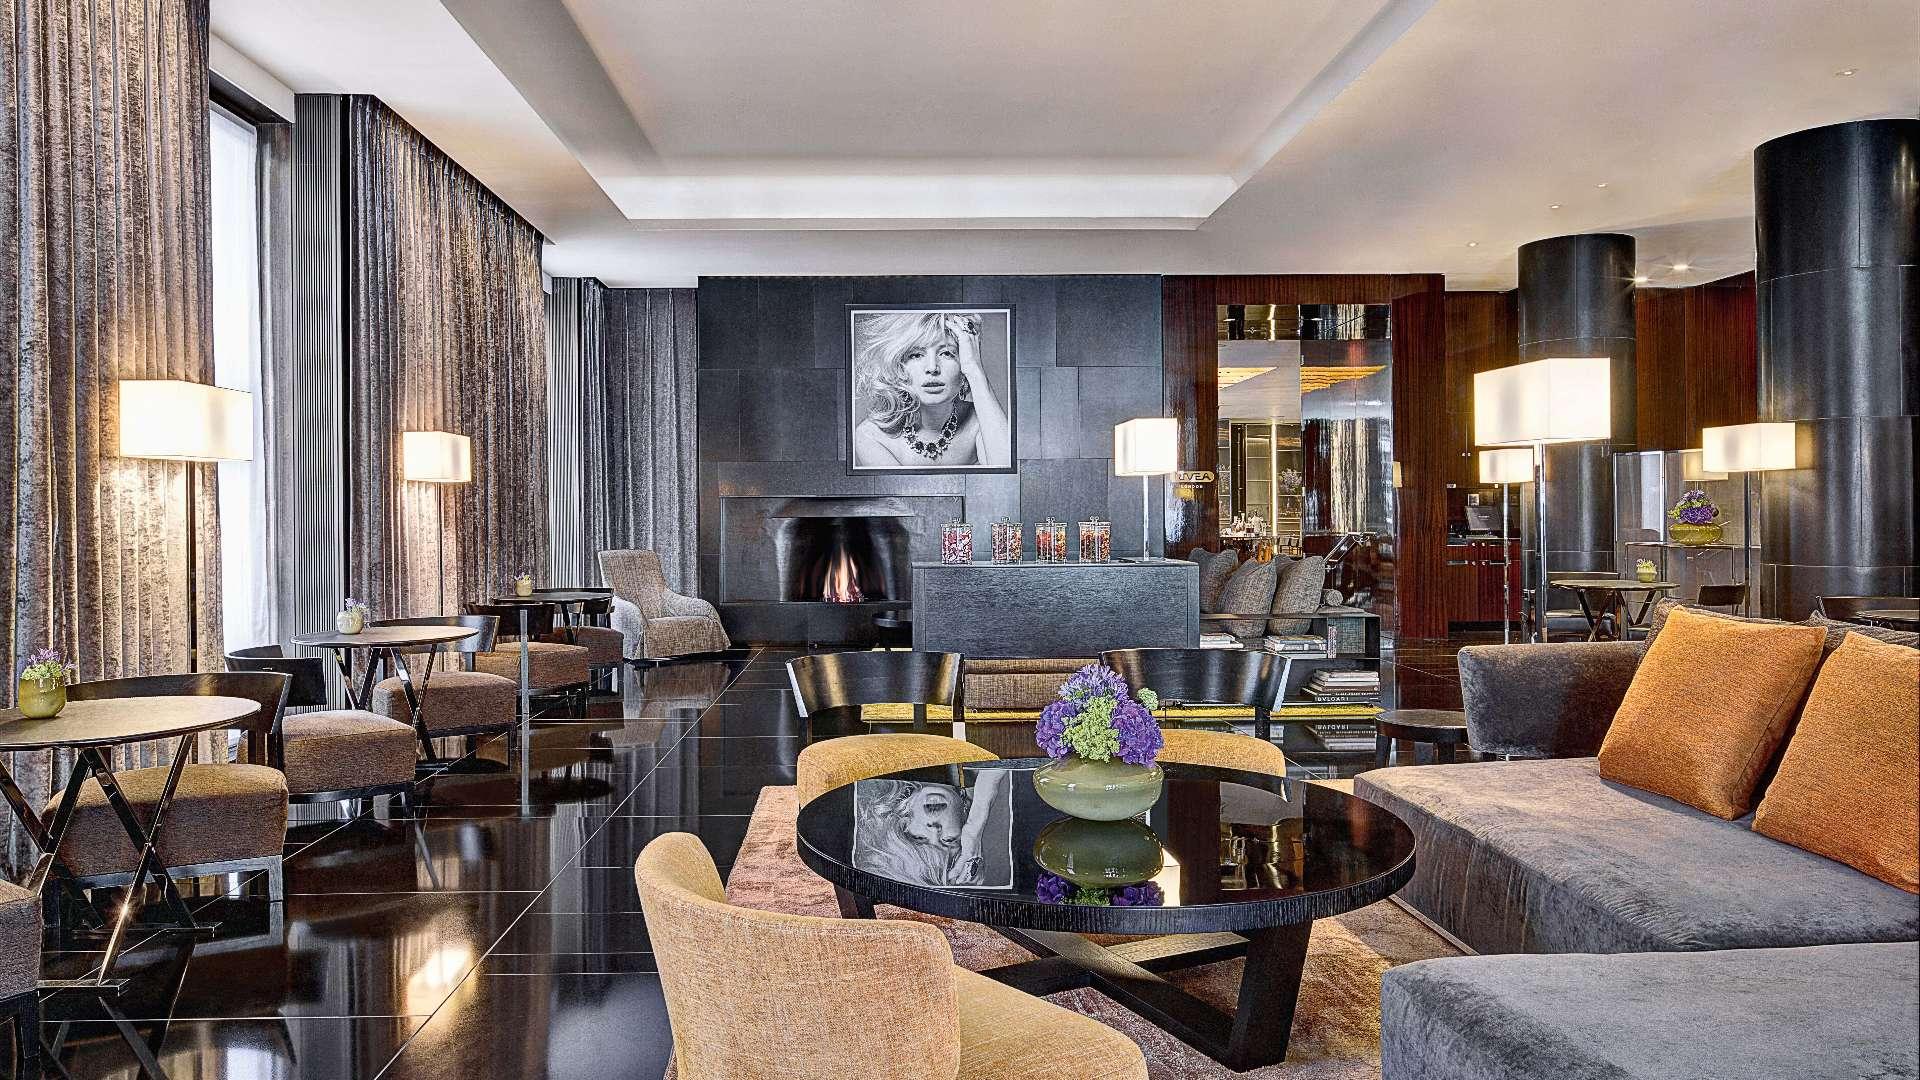 Bulgari Hotel London - Luxury Hotels - Fashion Designer Hotels - most beautiful hotels london - most luxurious hotels london